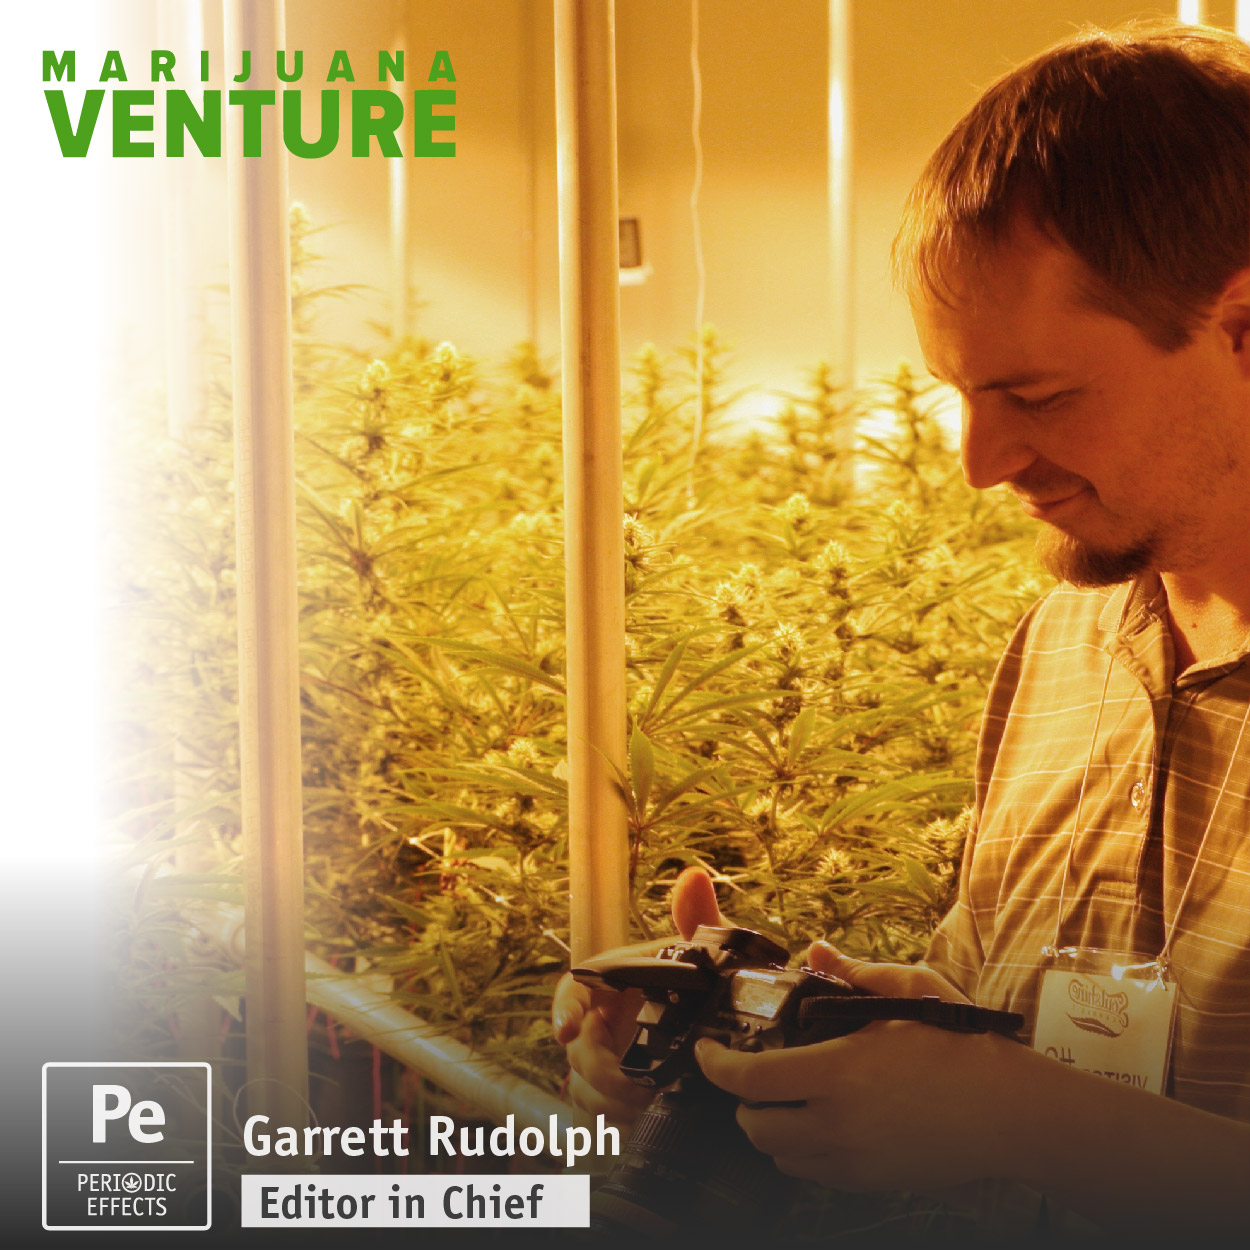 Garrett Rudolph, Editor in Chief for Marijuana Venture, a professional trade magazine for the cannabis industry